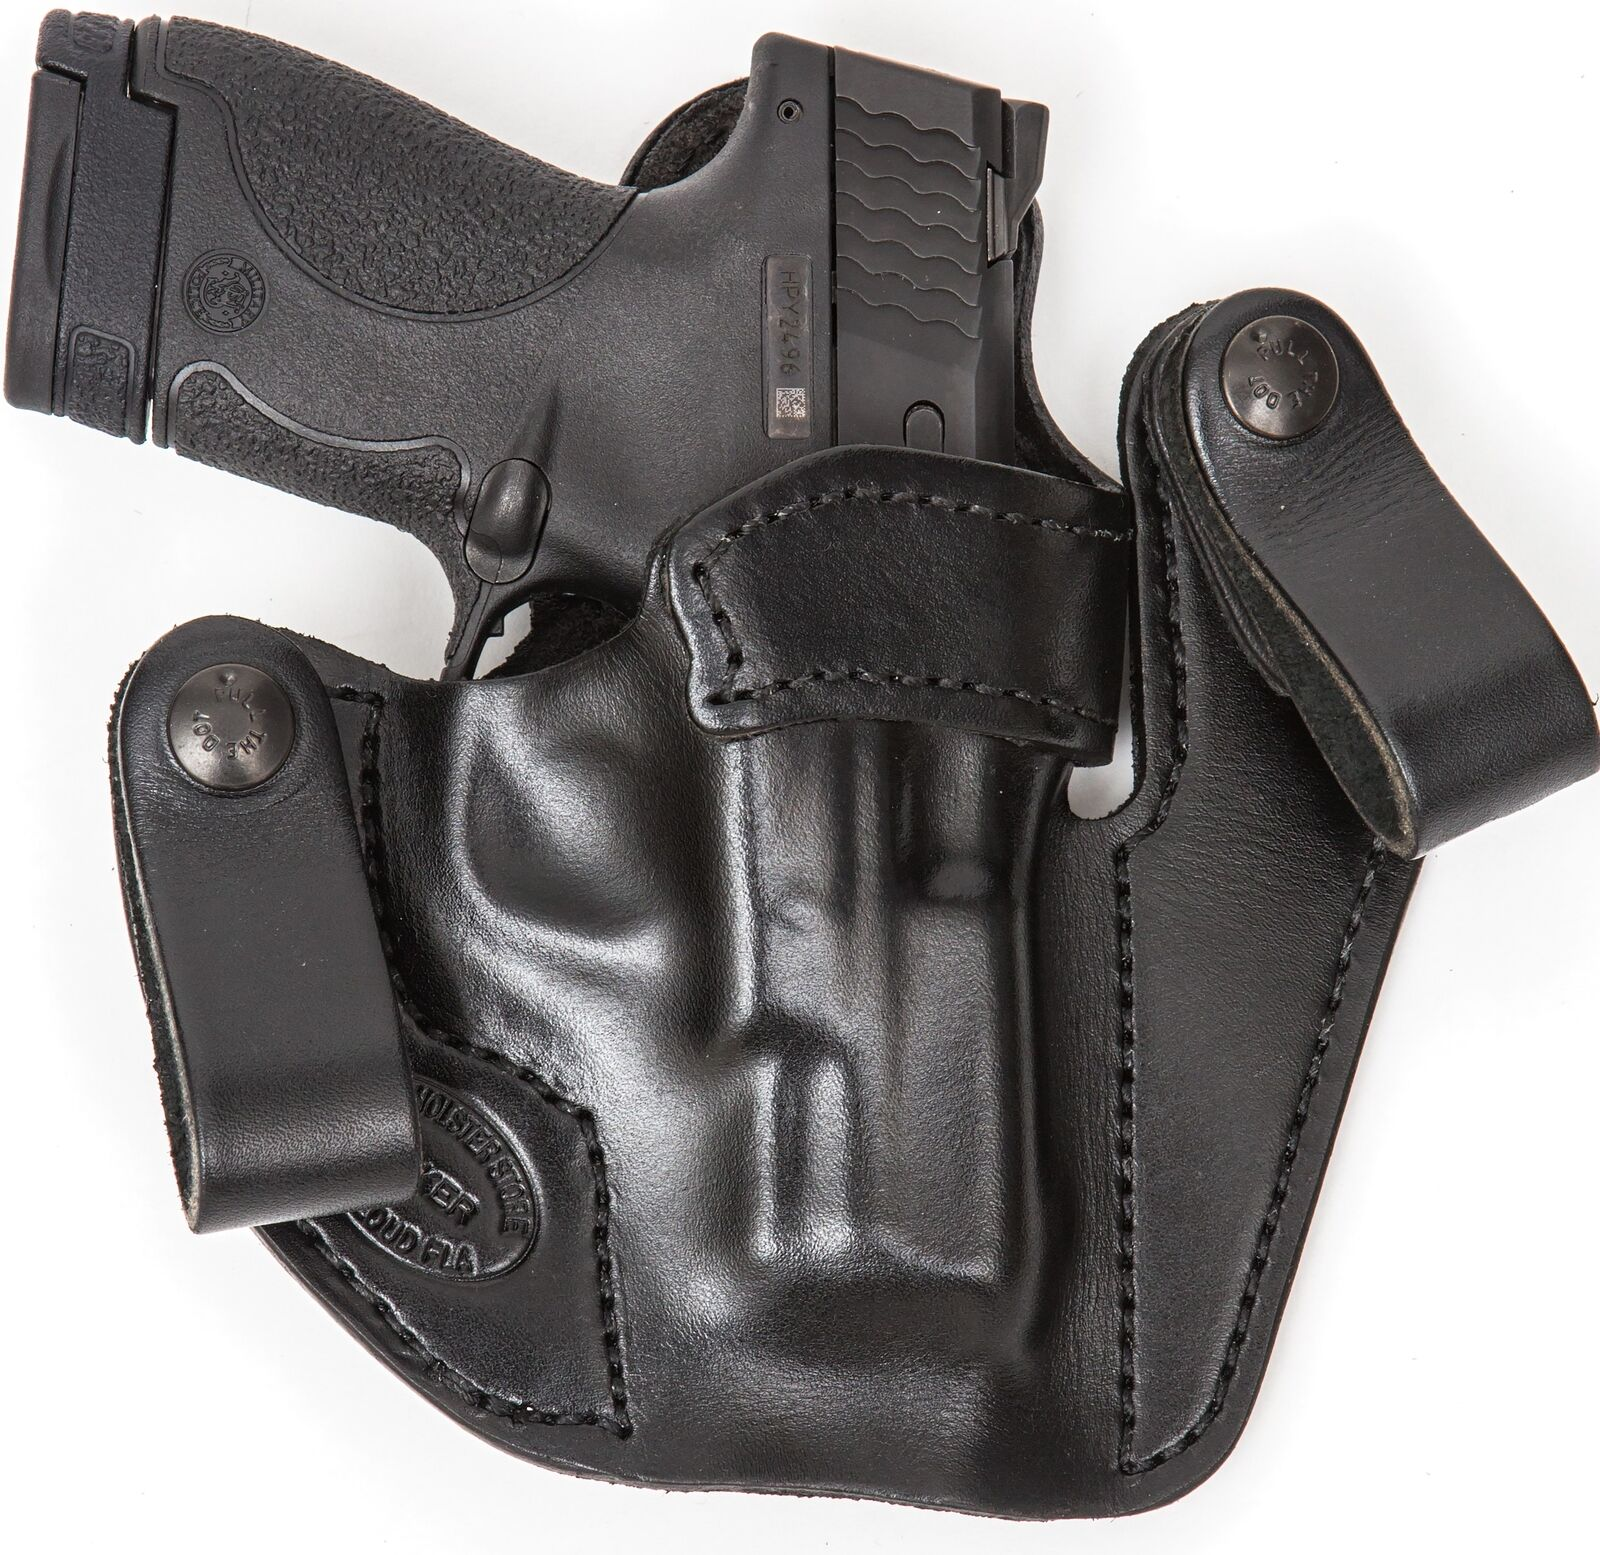 XTREME IWB CARRY RH LH IWB XTREME Leder Gun Holster For Kel Tec P11 3db689